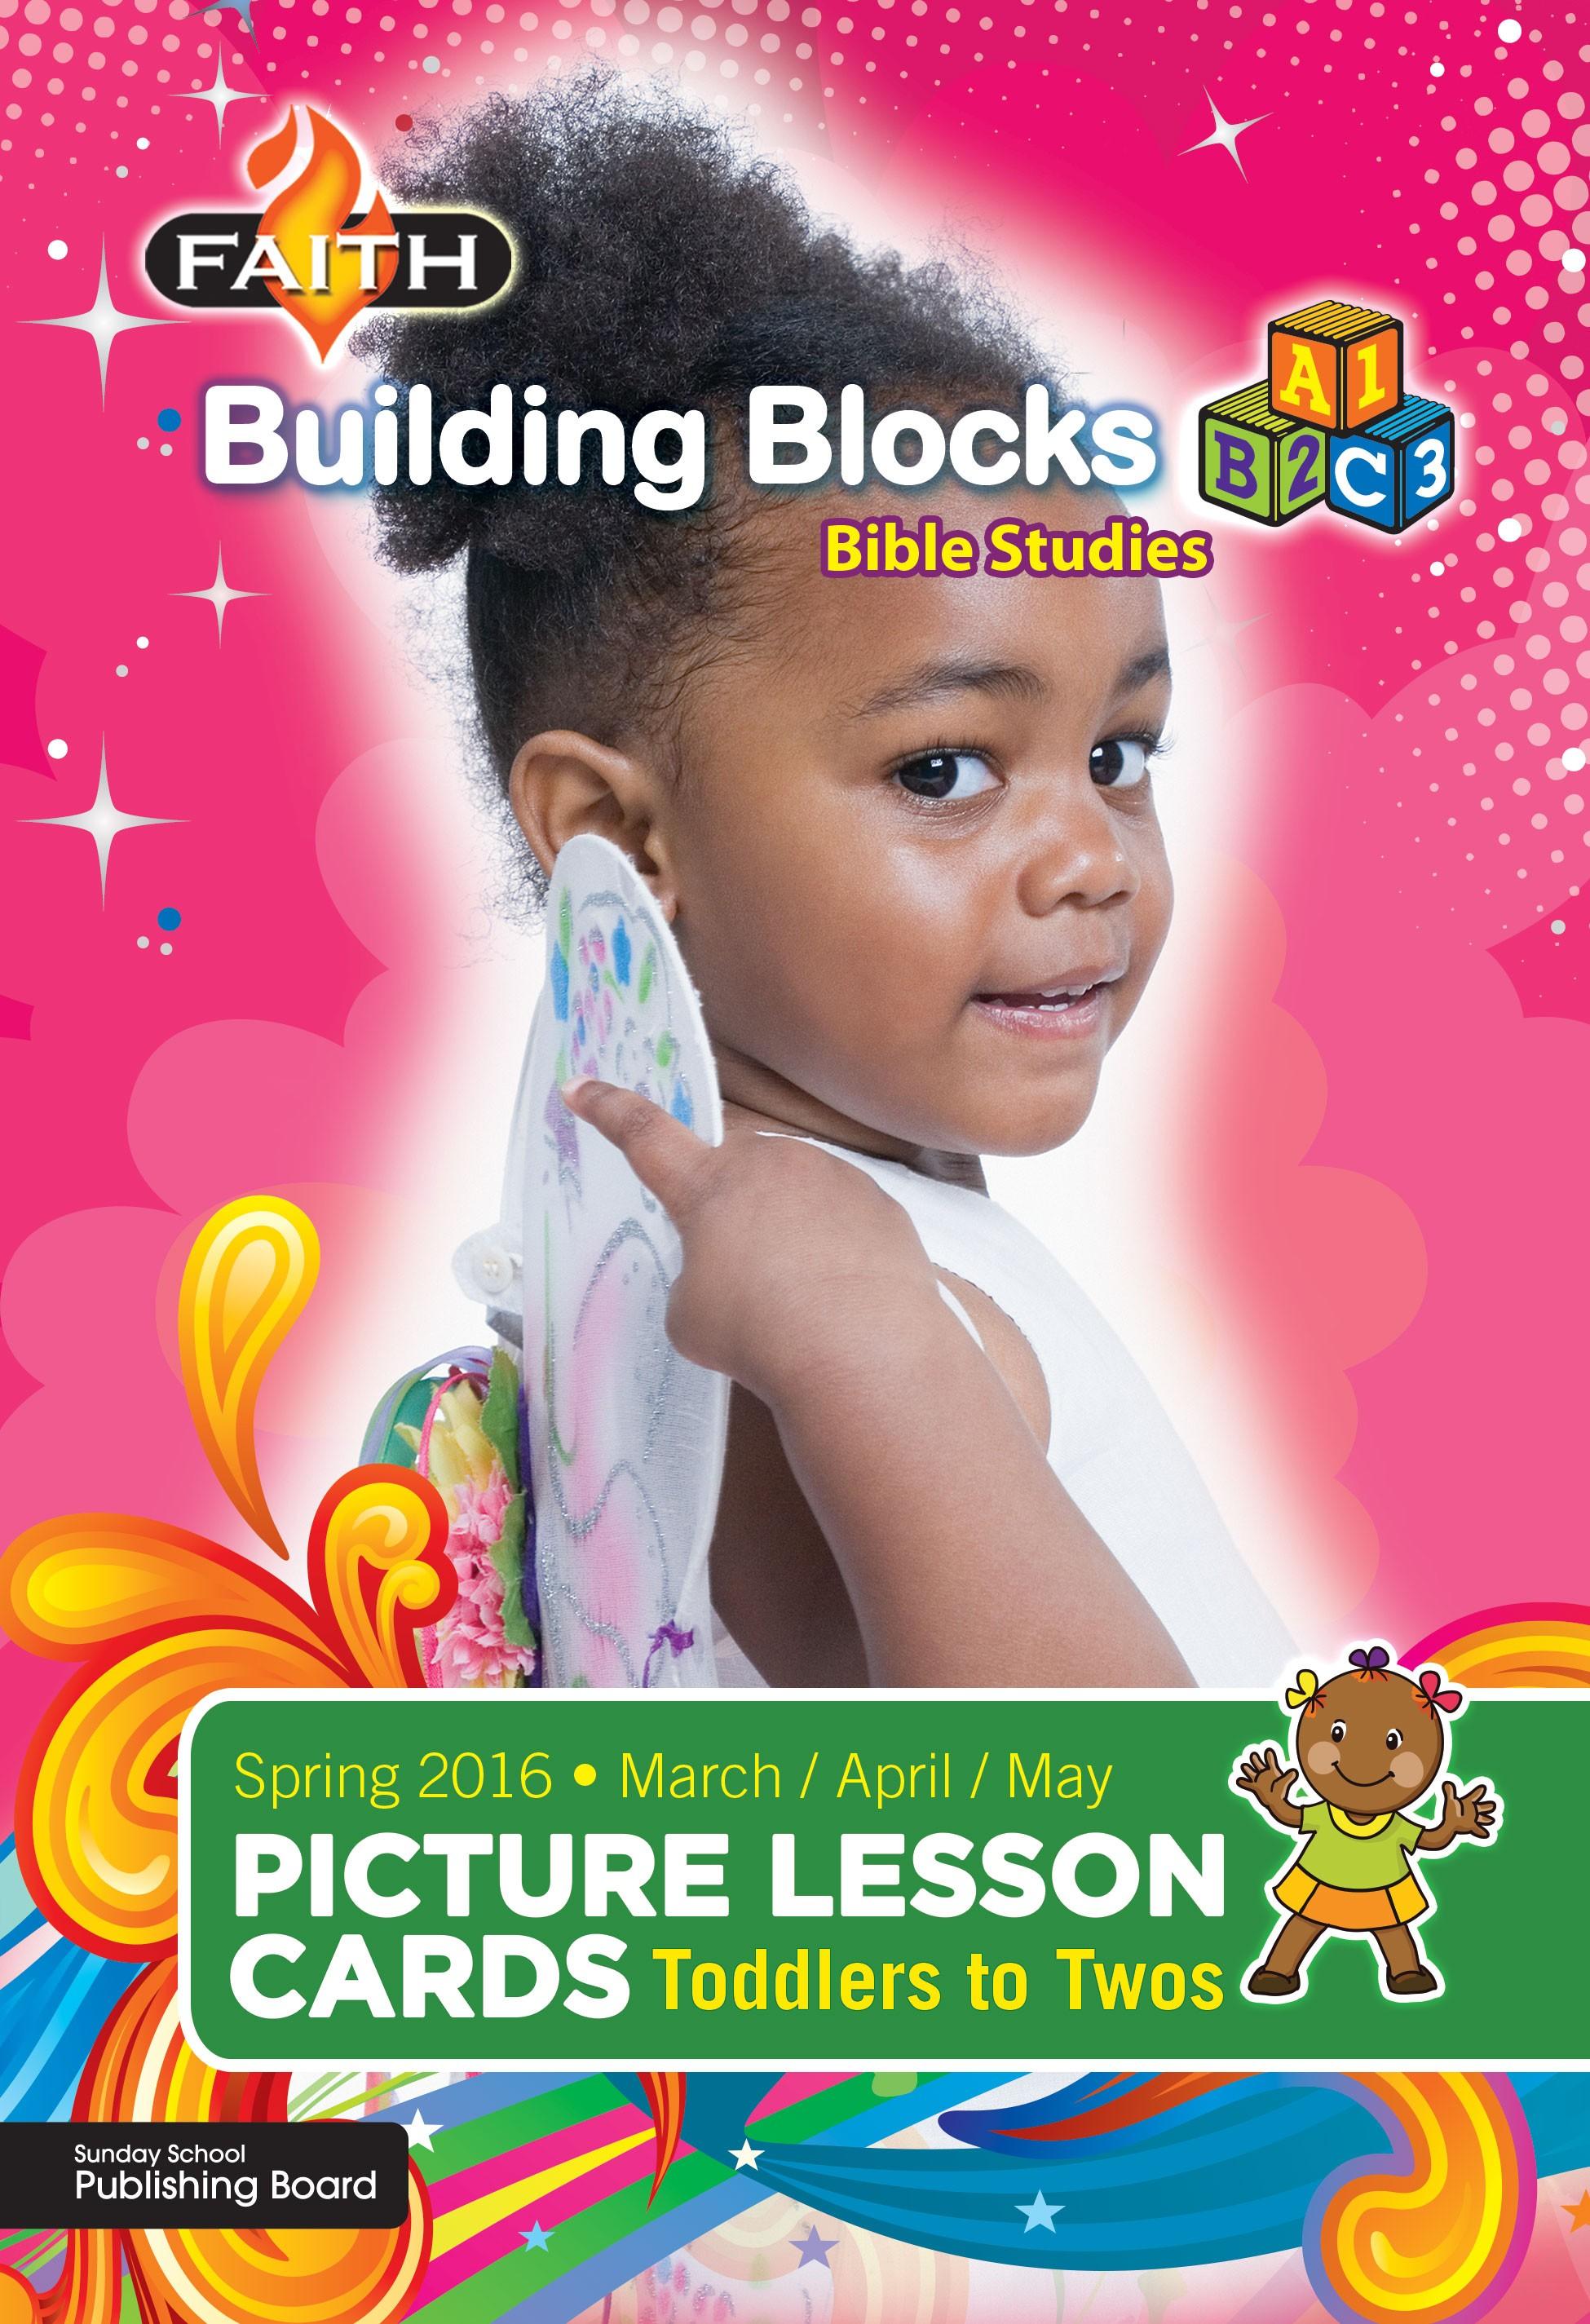 Faith Building Blocks Bible Stu S Early Elementary Grades K 1